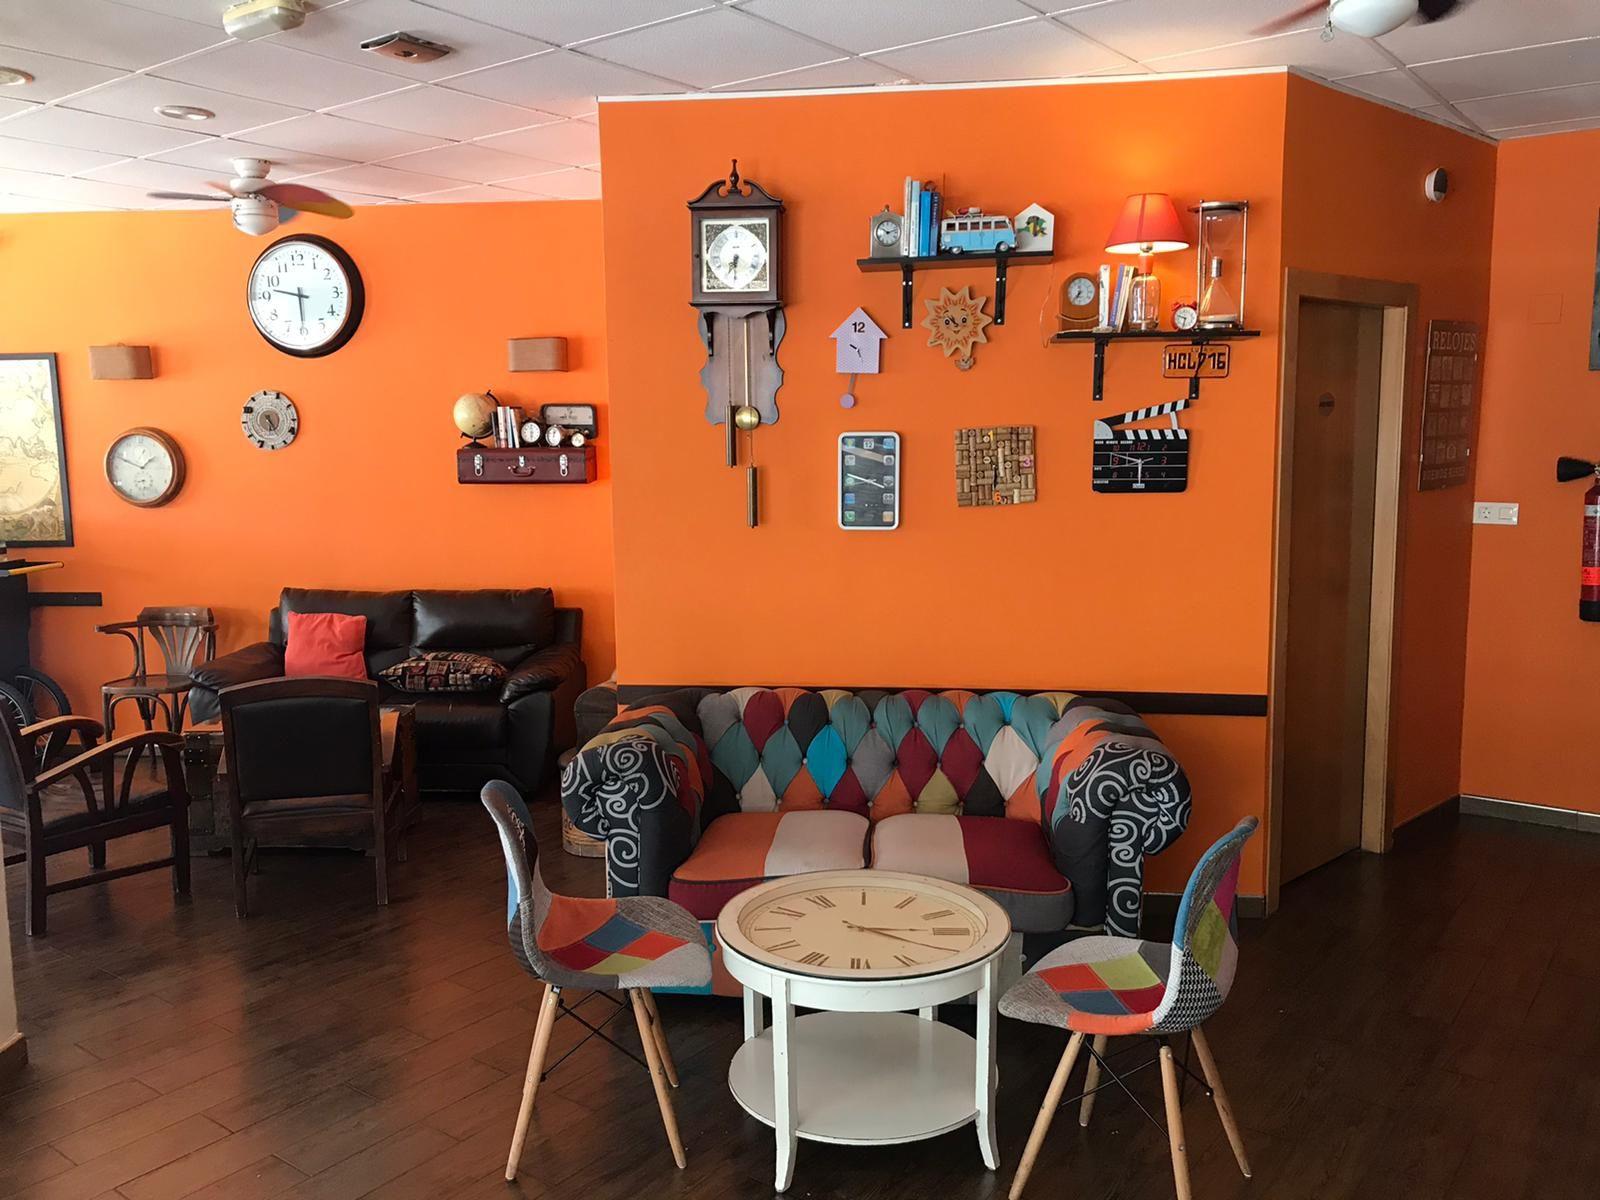 Foto 4 de Restaurante en Valencia | Cafetería Tosteria O´Clock